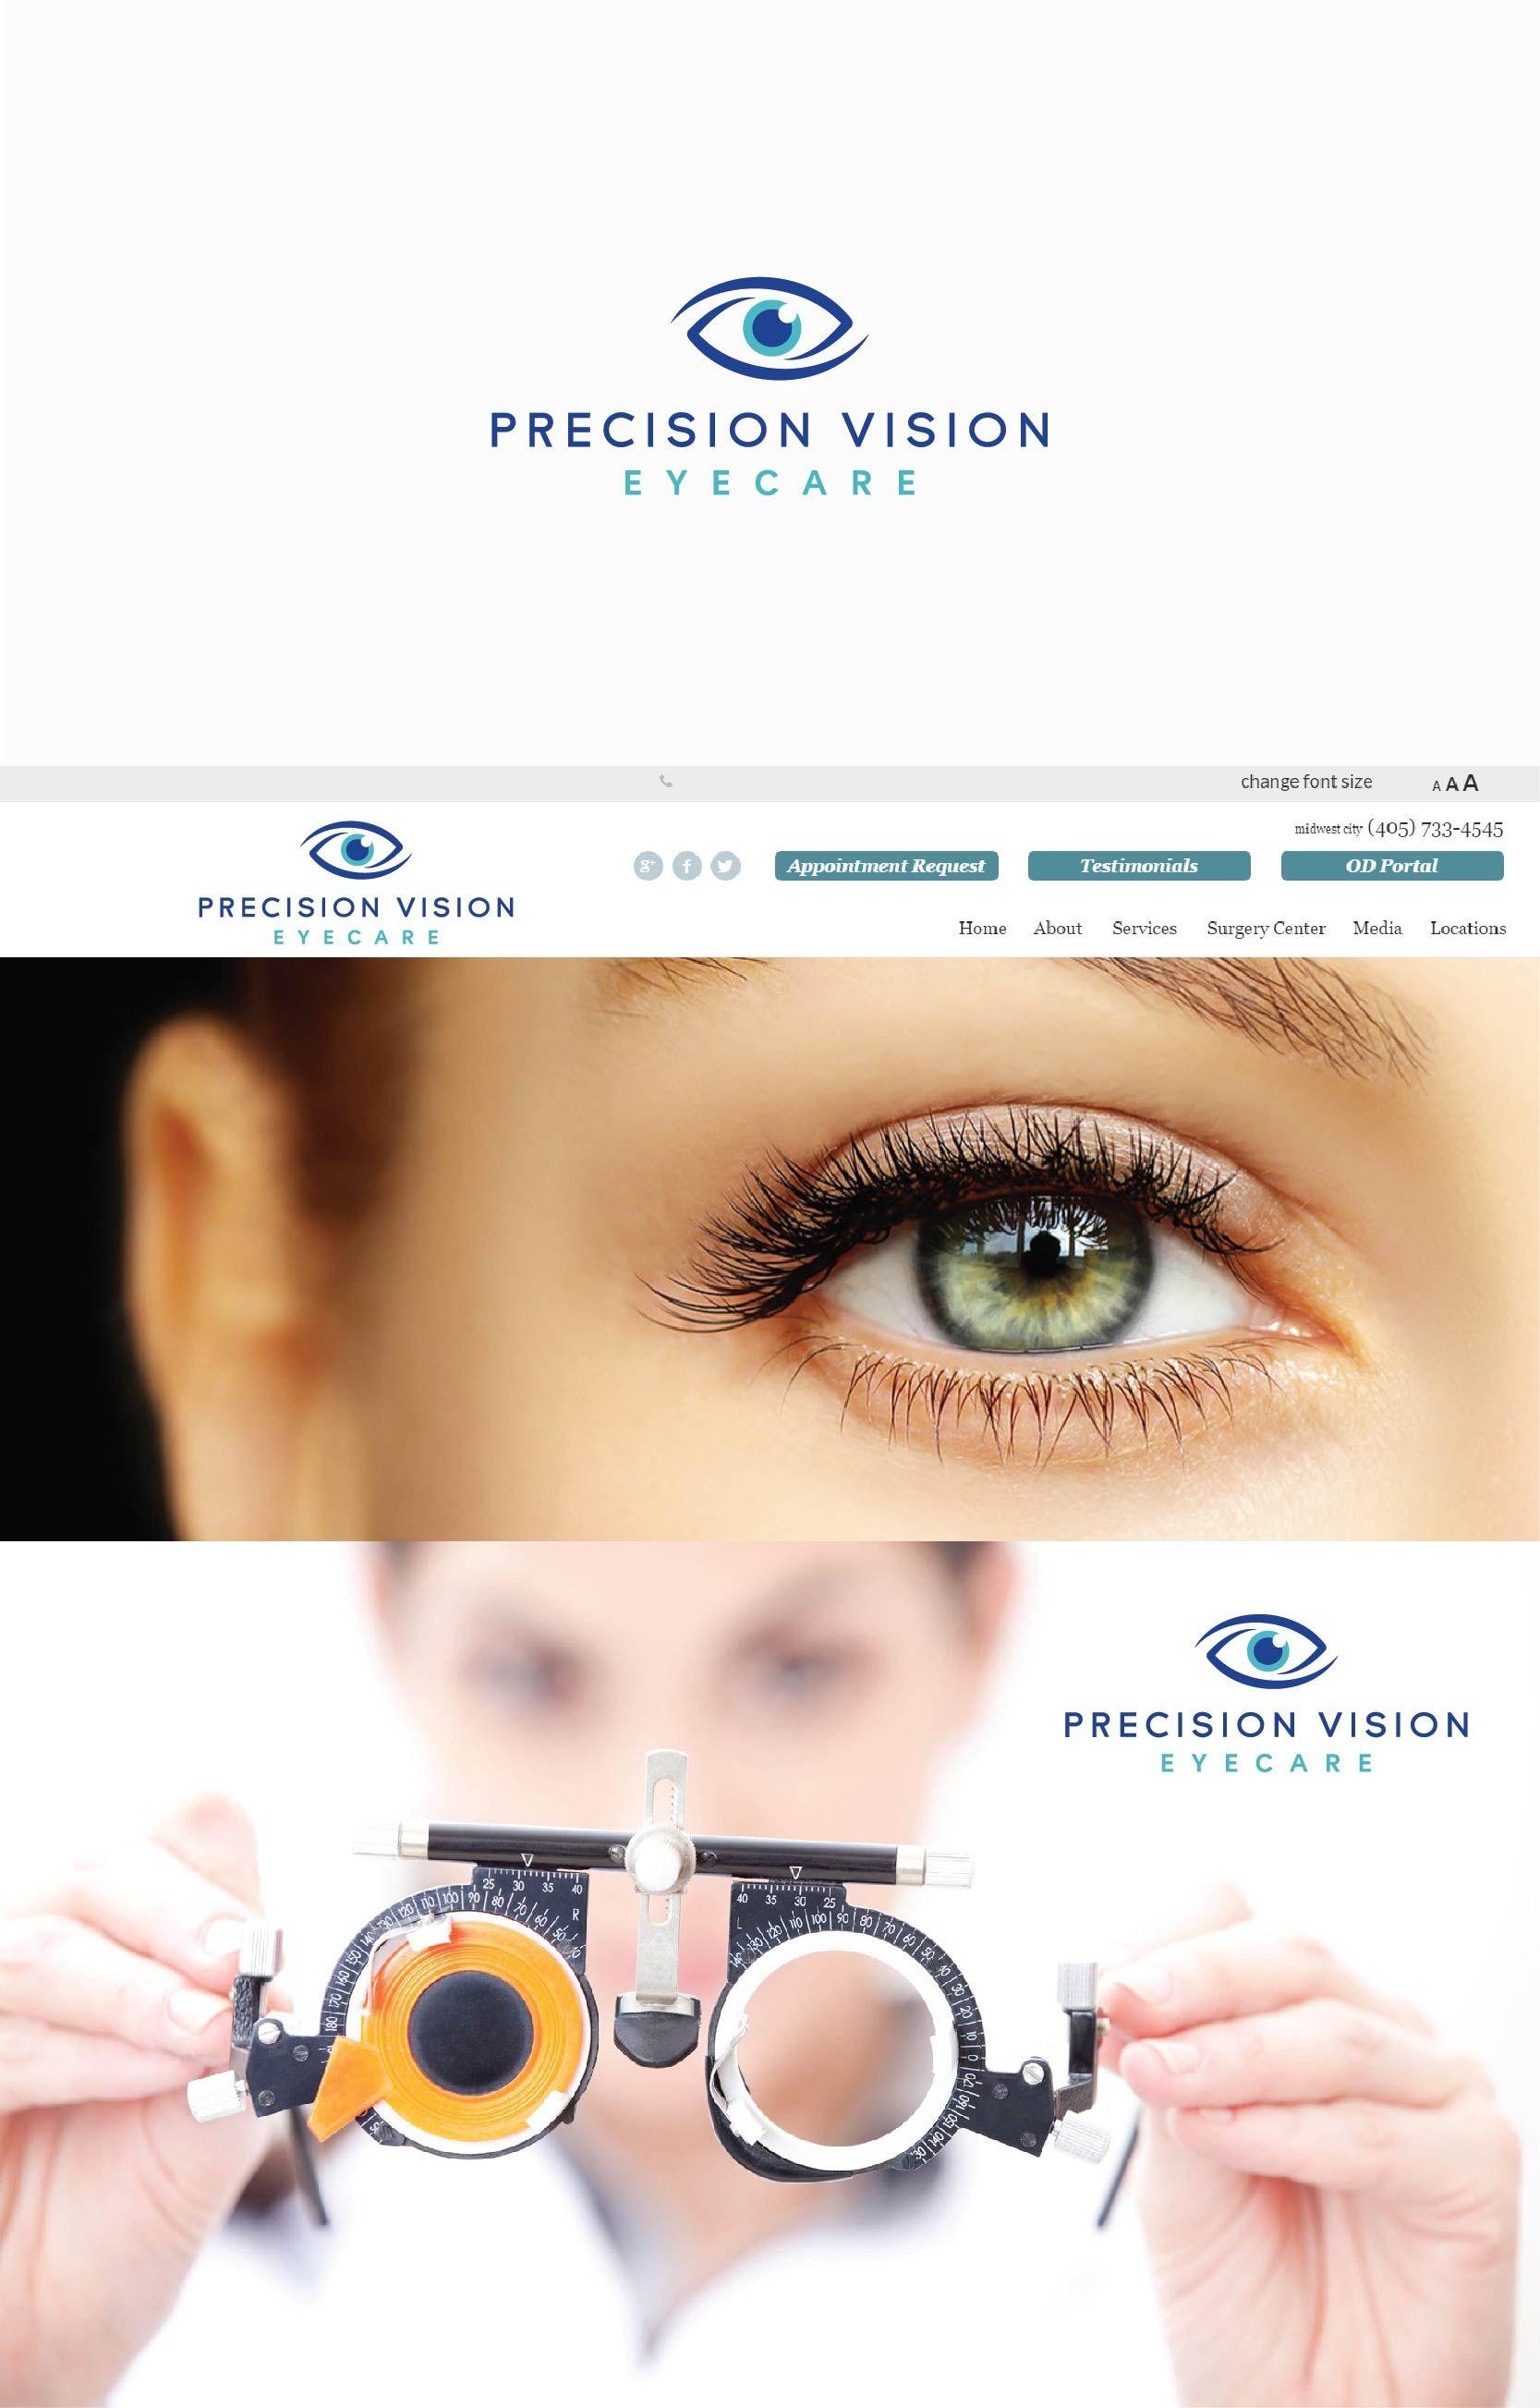 Design 100 by VICKODESIGN Design a Unique Vision Care